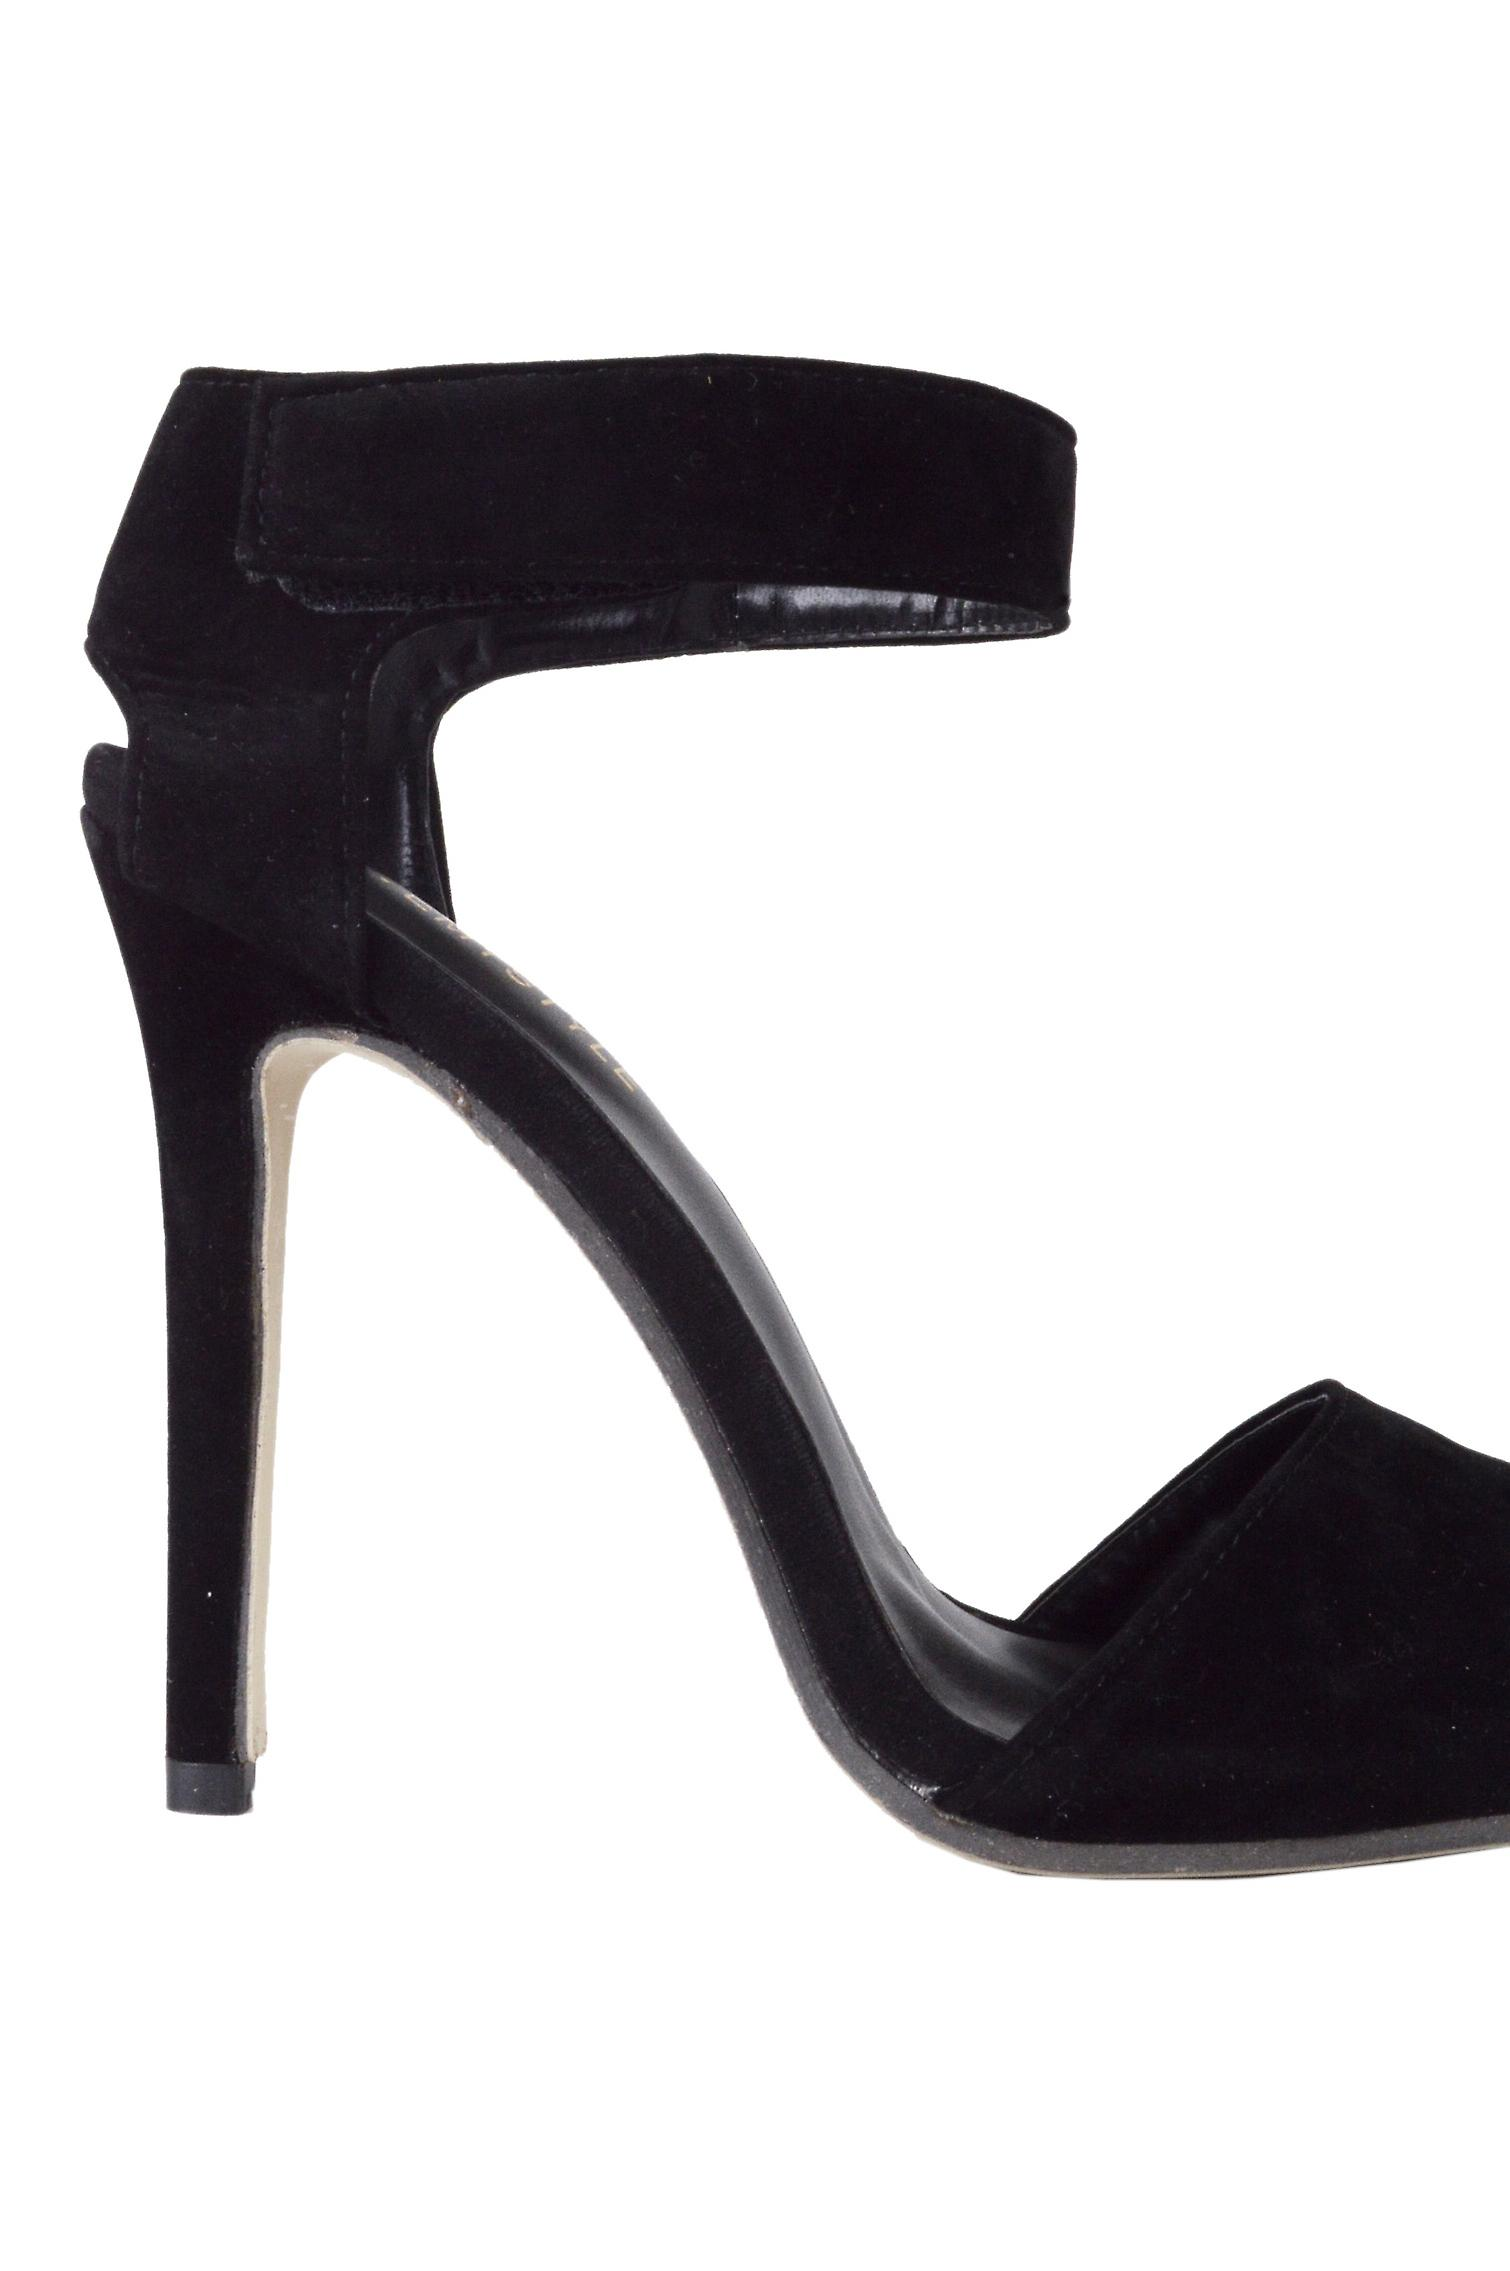 Lovemystyle Velvet Pointed Heels In Black